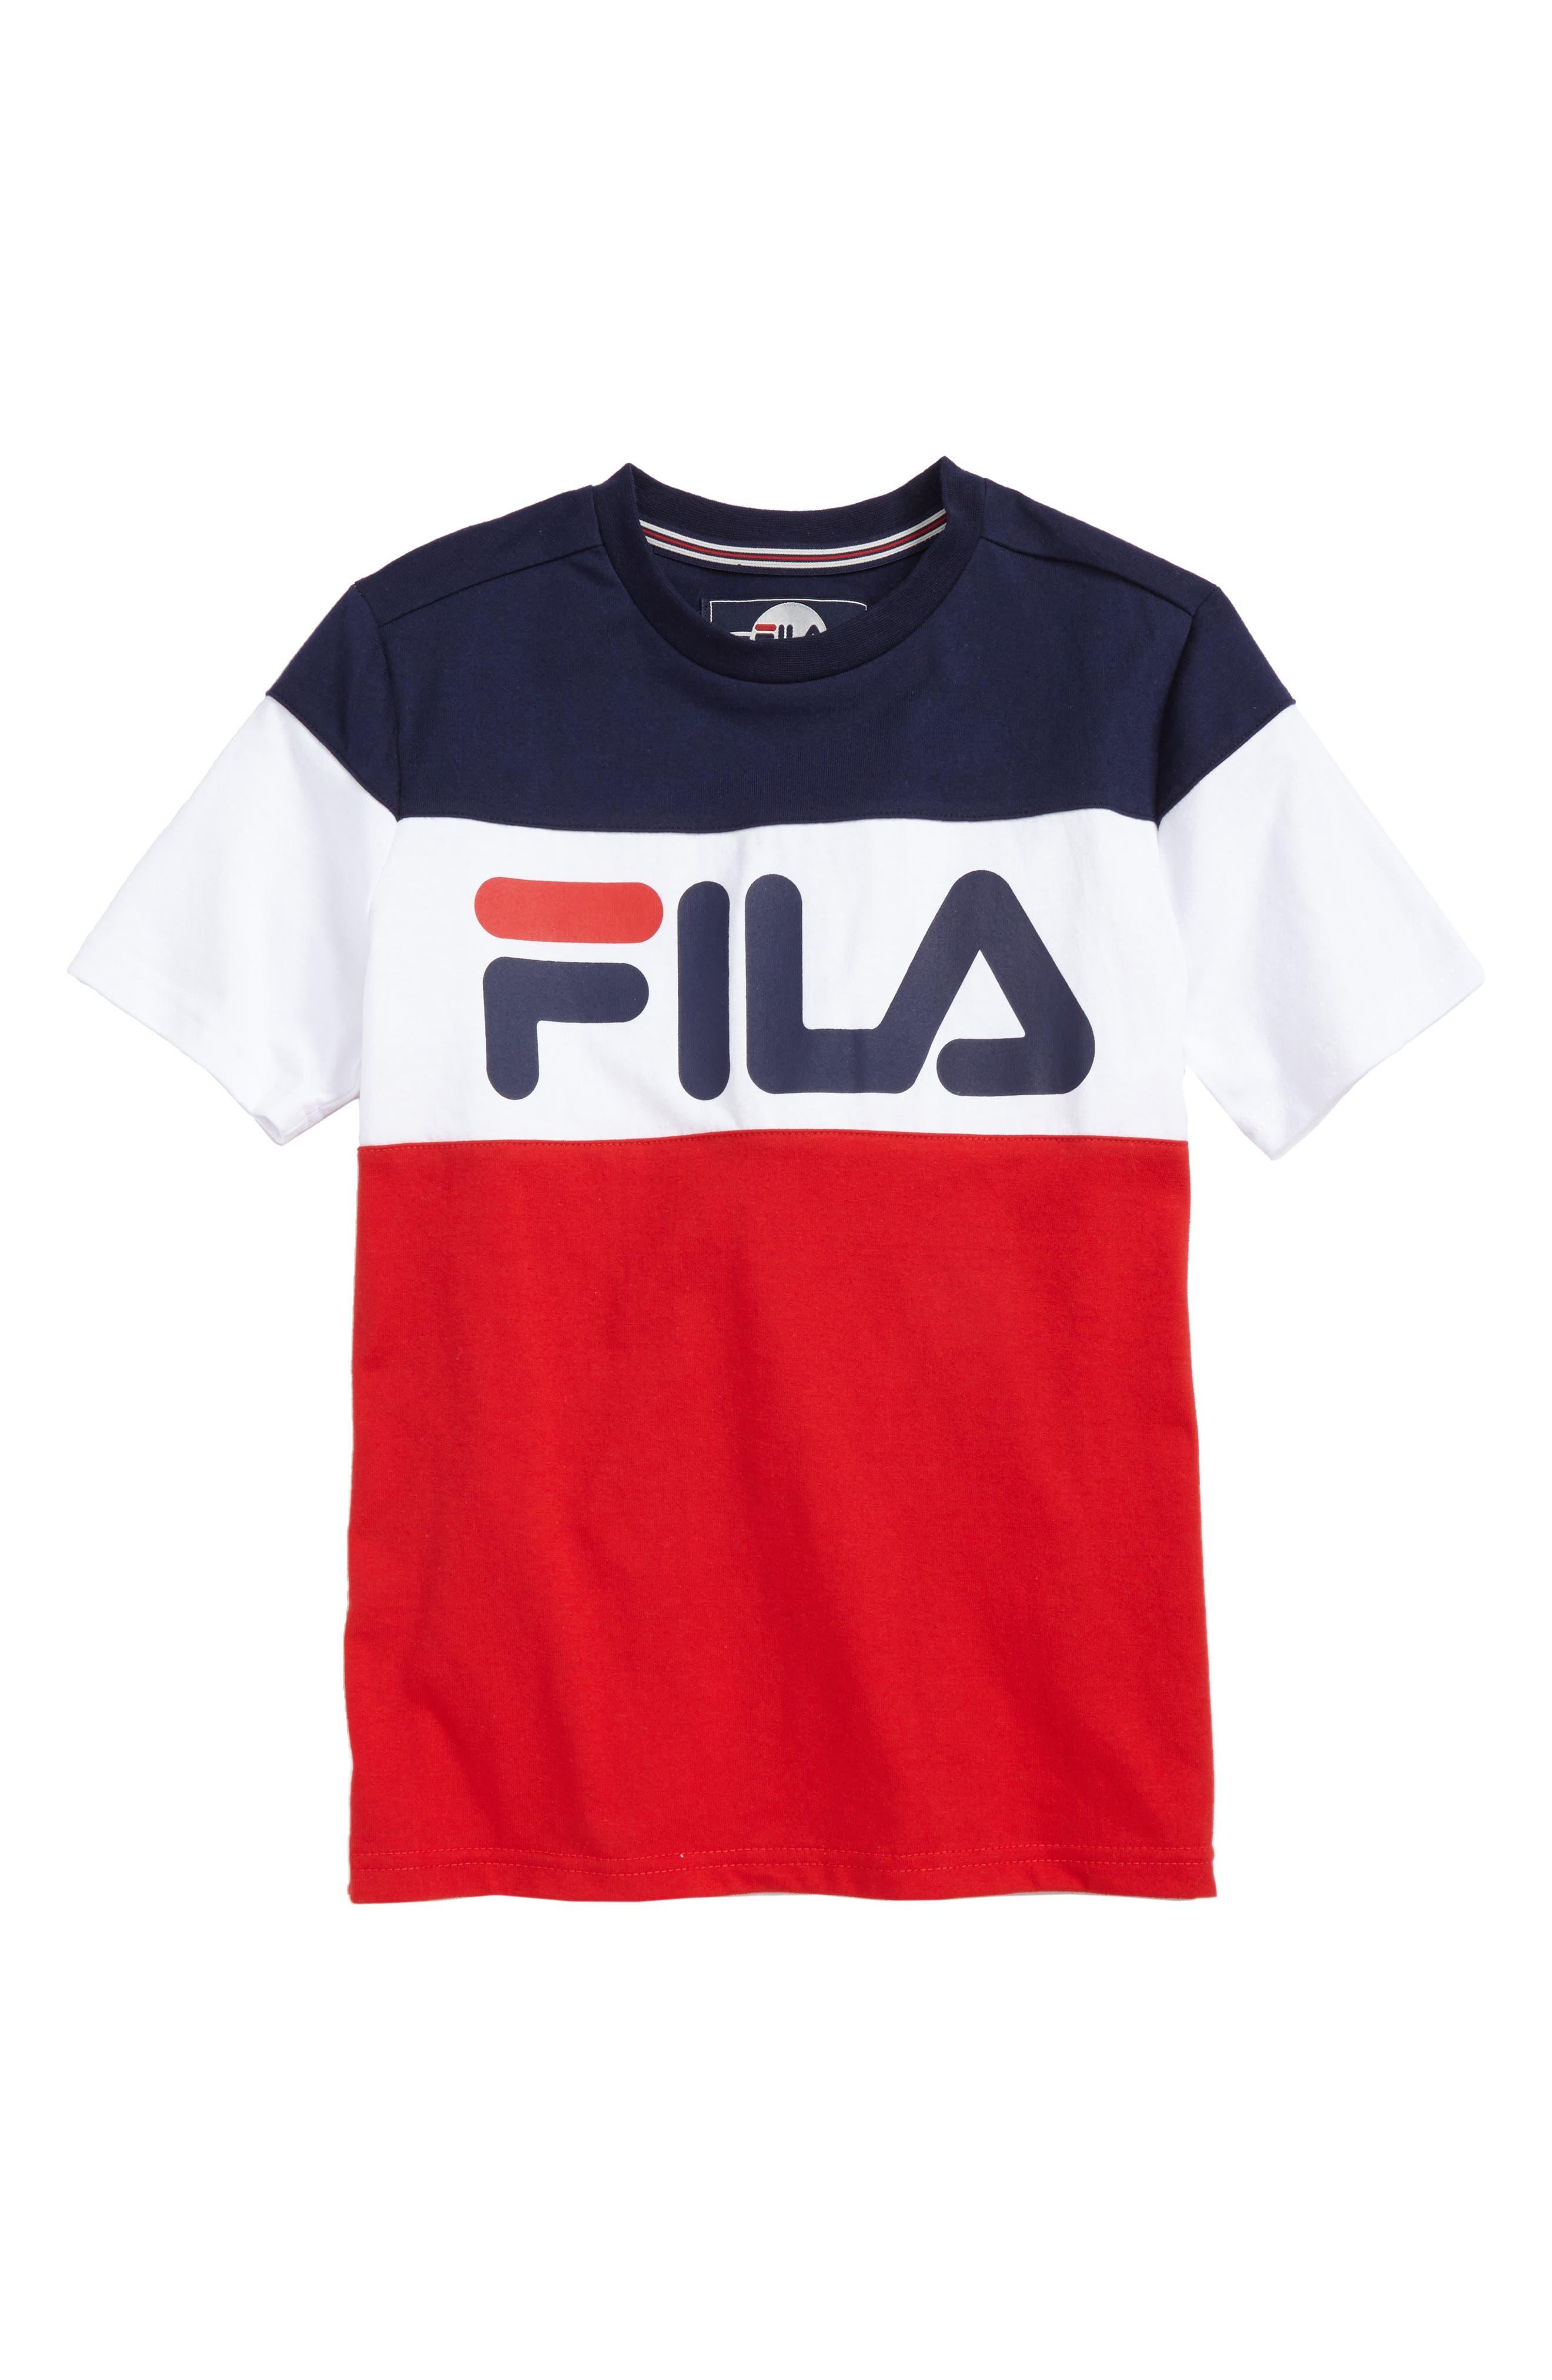 Alternate Image 1 Selected - FILA Colorblock Logo T-Shirt (Big Boys)